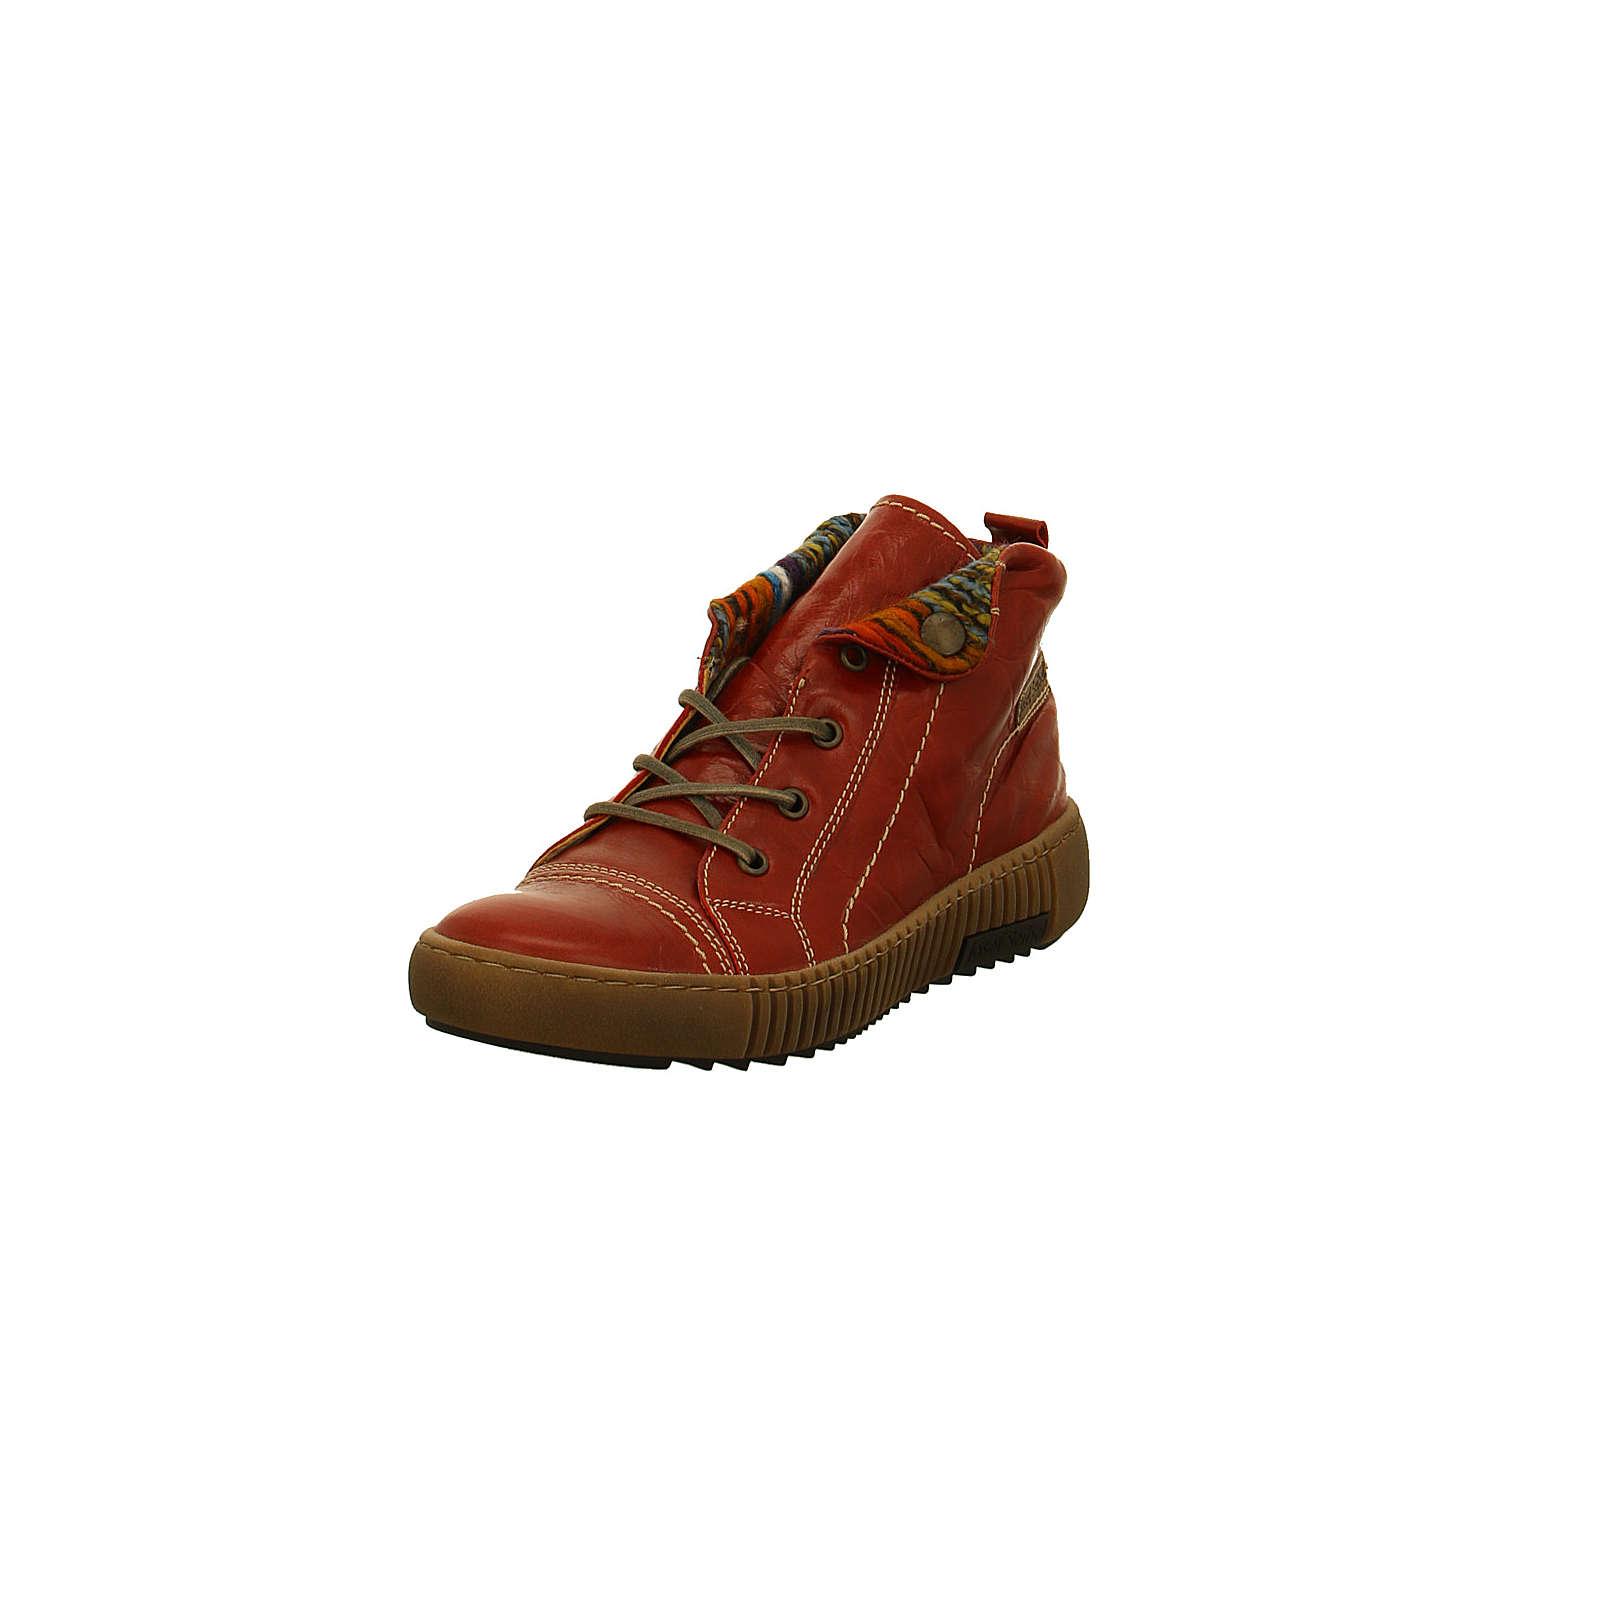 Josef Seibel Damen Winterboots – Maren 09 – Glattleder in rot – 84609/PL88452 Schnürstiefeletten rot-kombi Damen Gr. 39